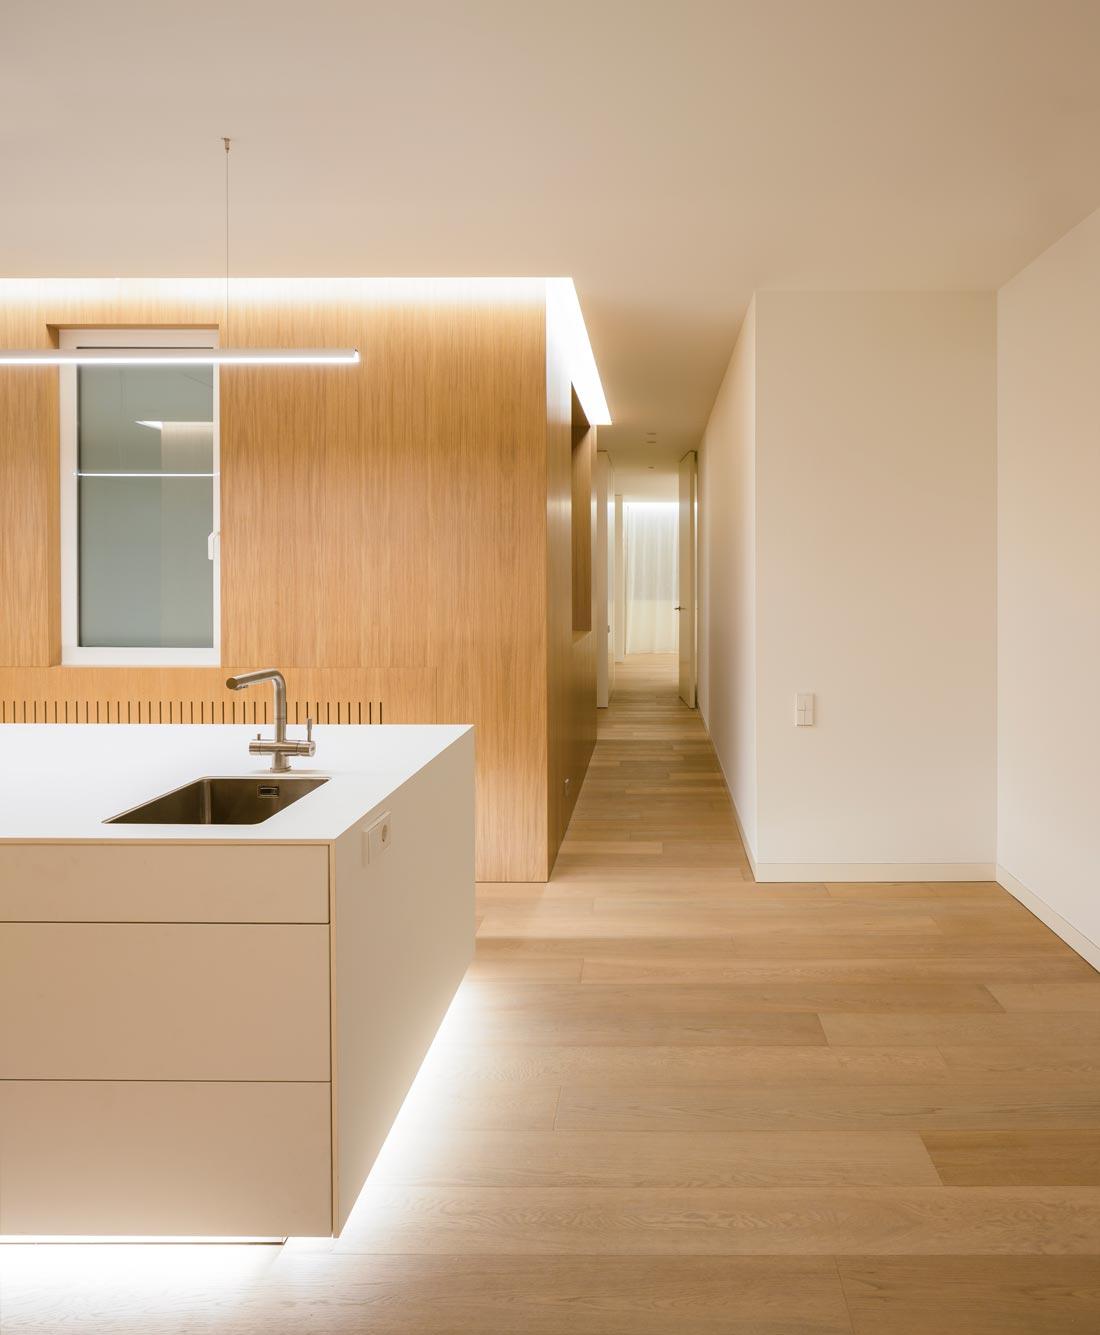 mayordomo architecture homu spanish architects white kitchen